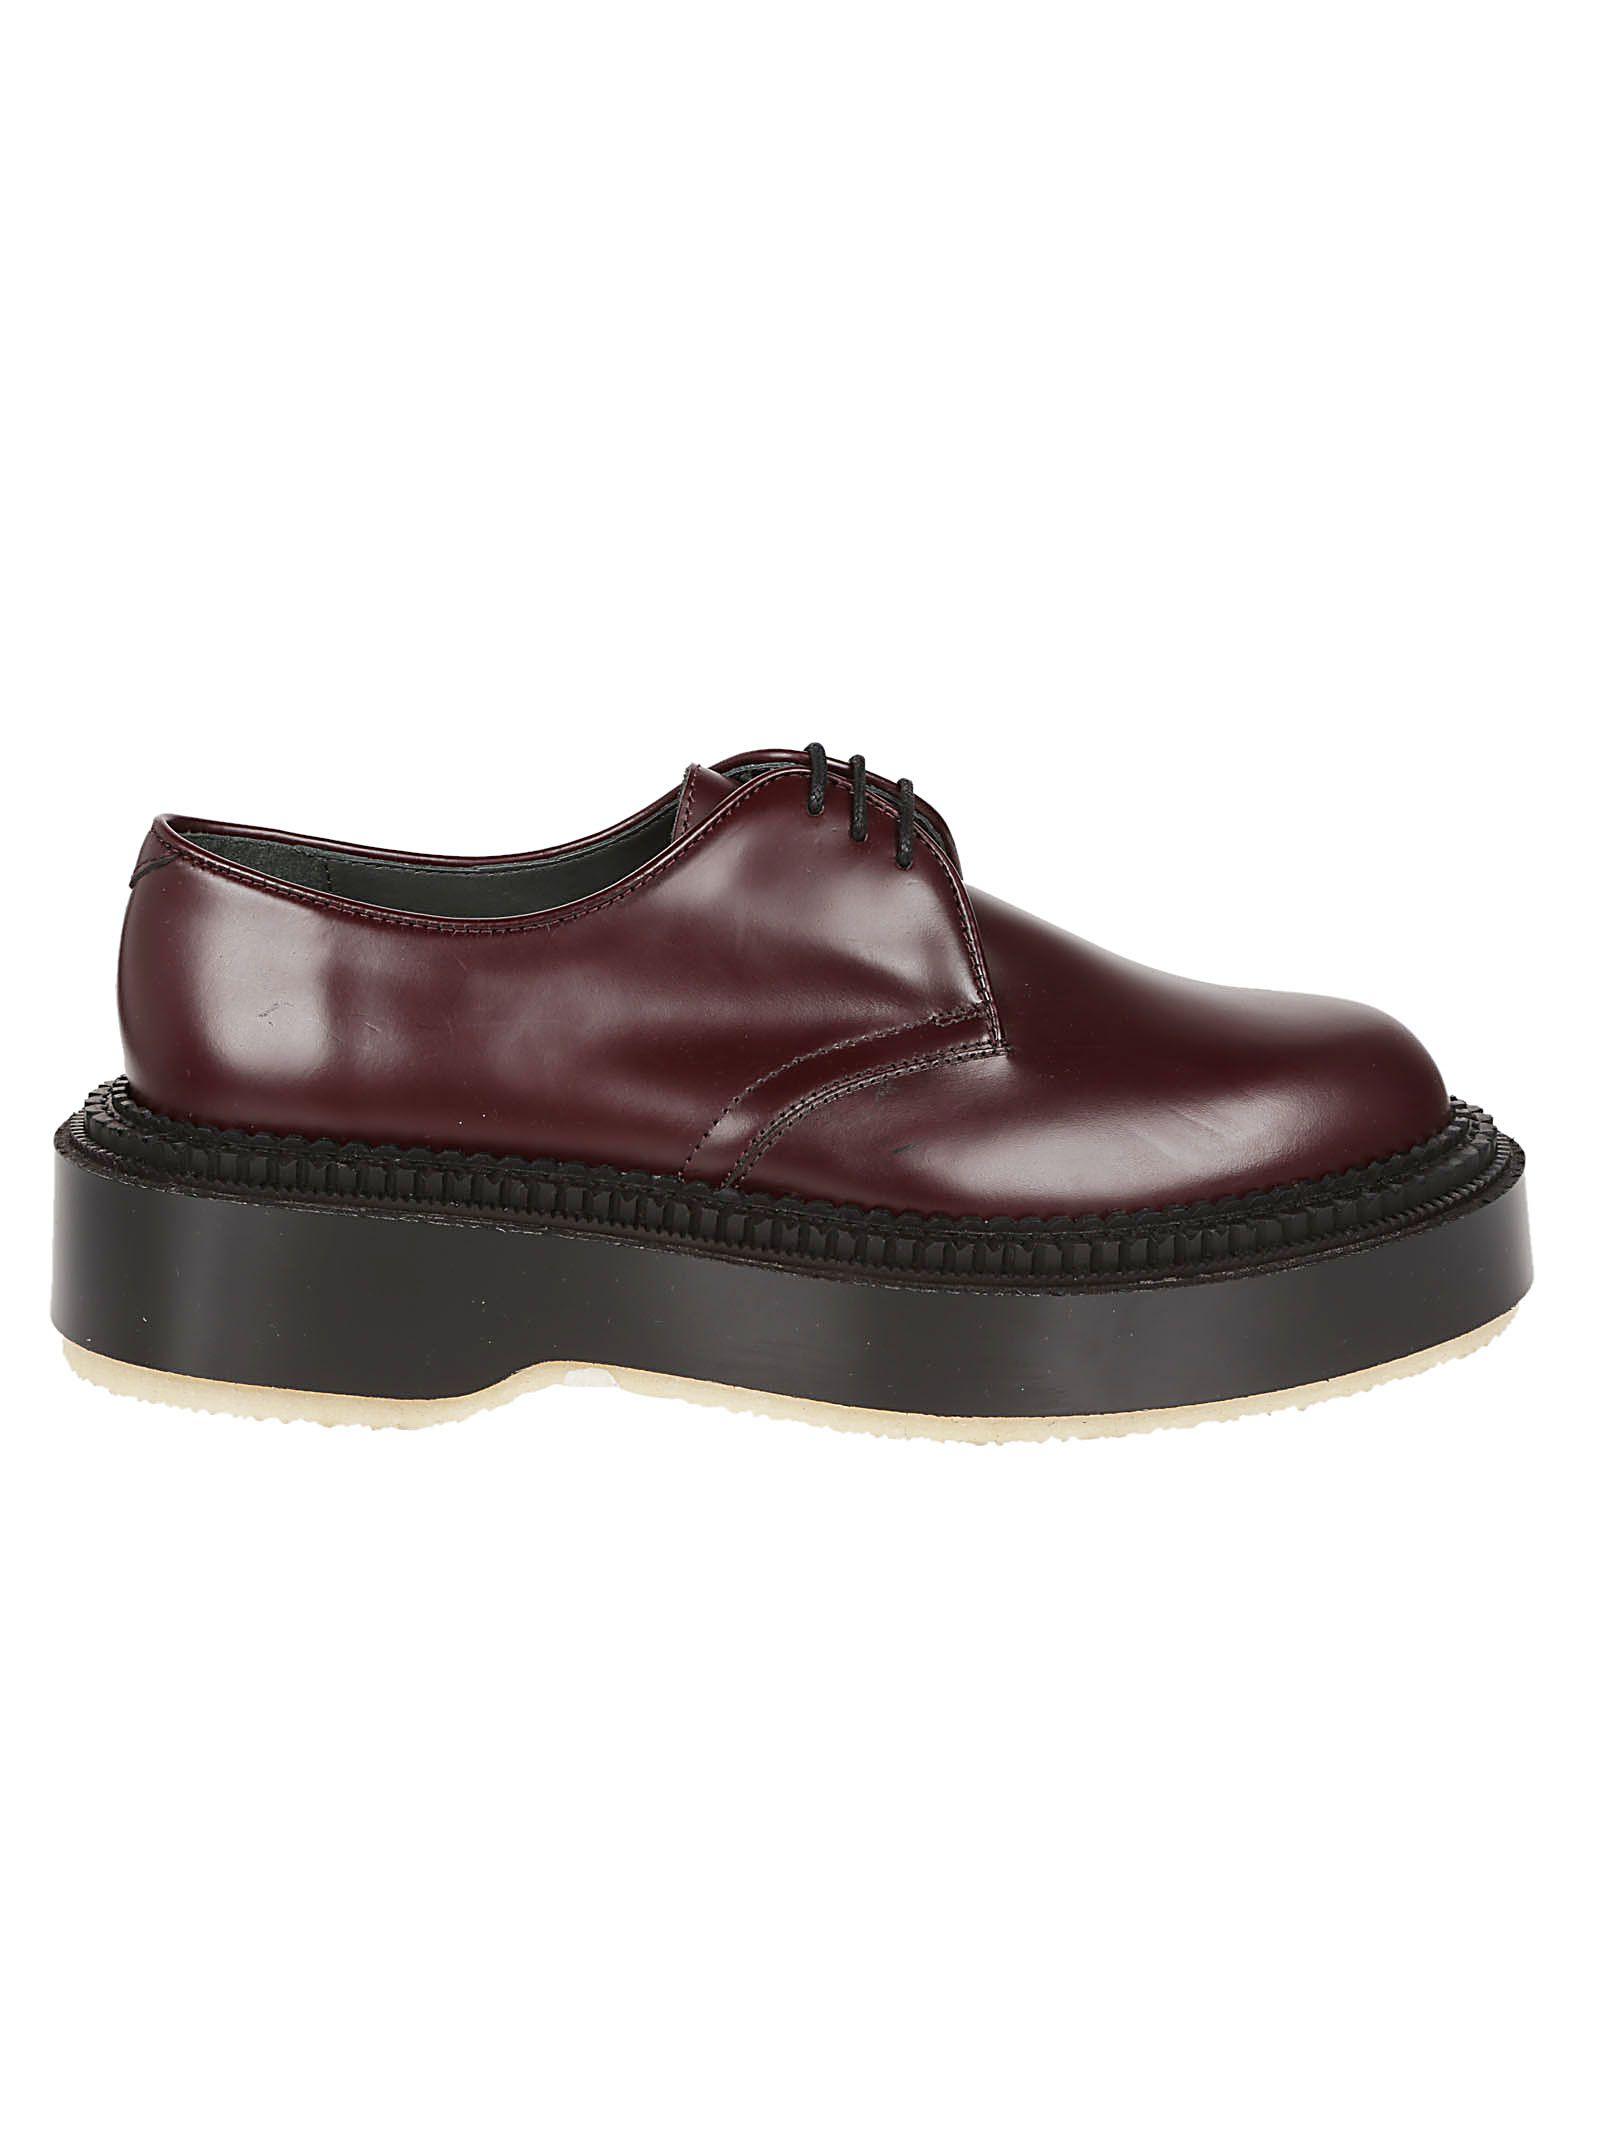 Adieu X Undercover Platform Oxford Shoes